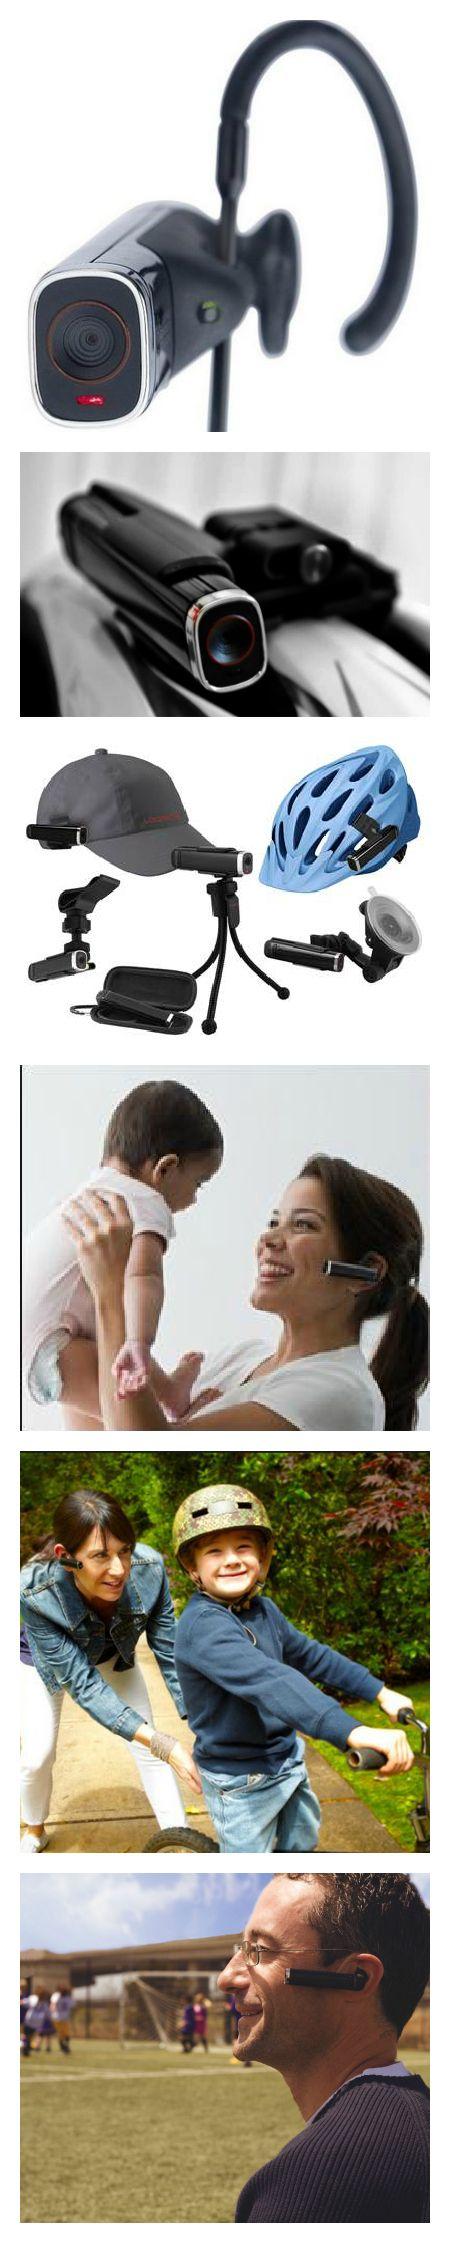 Looxcie LX2 Wearable Video Camera 이거 괜찮네! 특히 아기들에겐 카메라찍기 어려울때 내 시선을 따라 동영상 찍어주는 것 참 돟은 아이디어